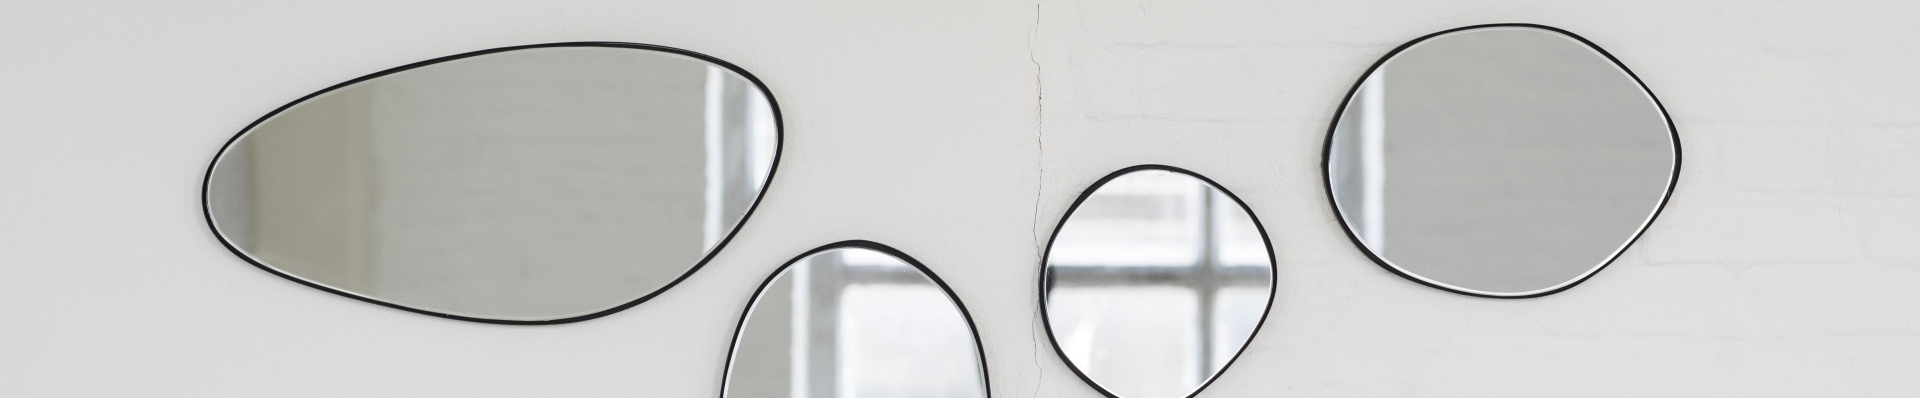 Serax spiegels